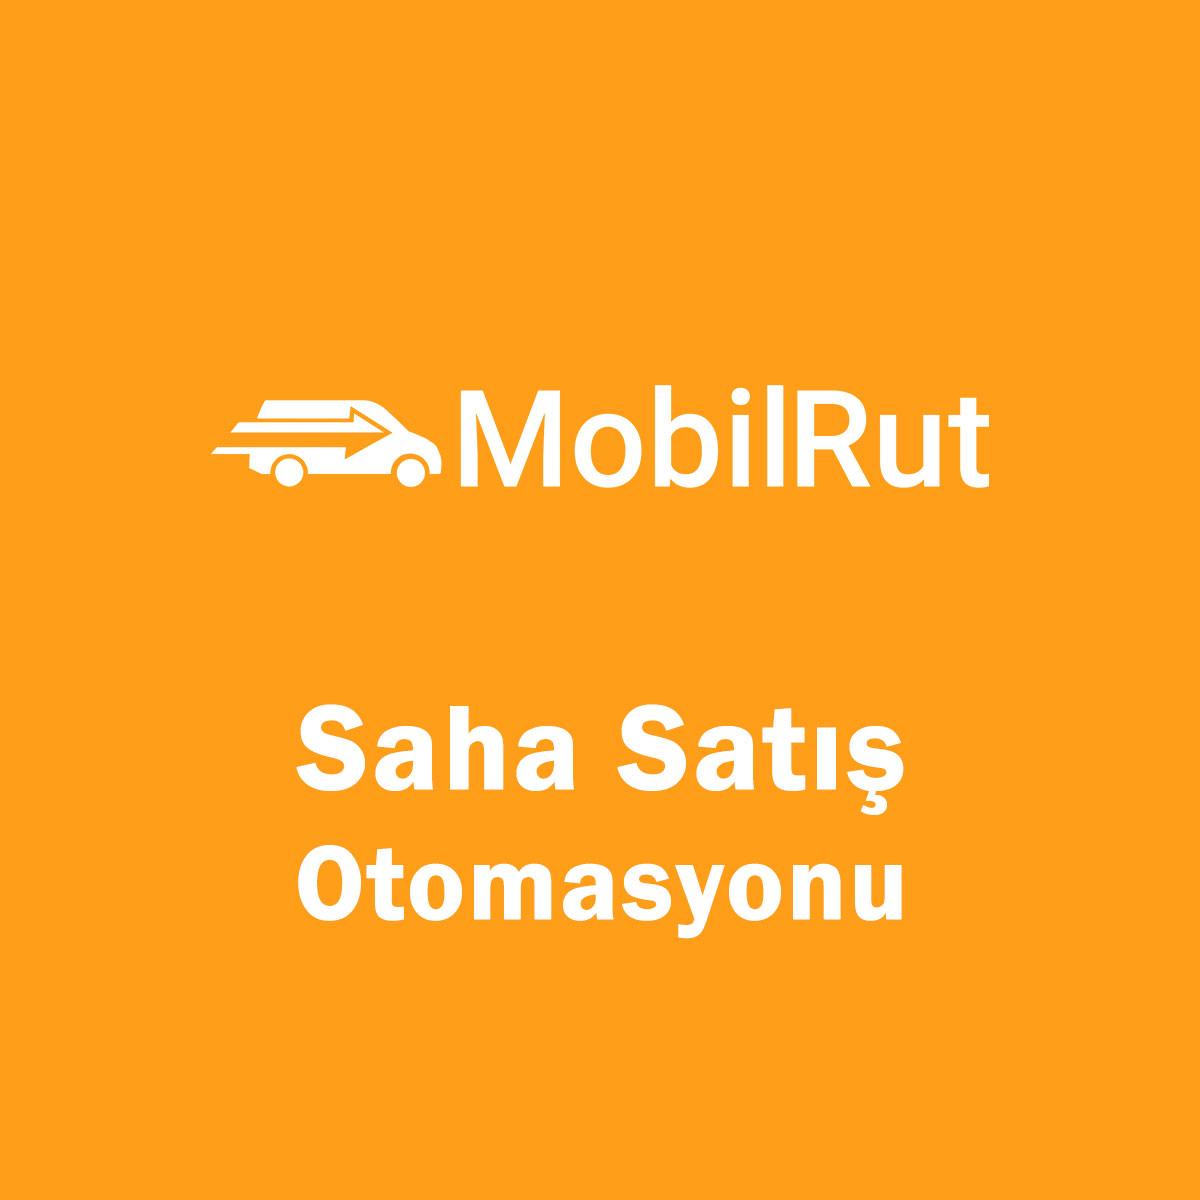 Mobilrut Saha Satış Programı